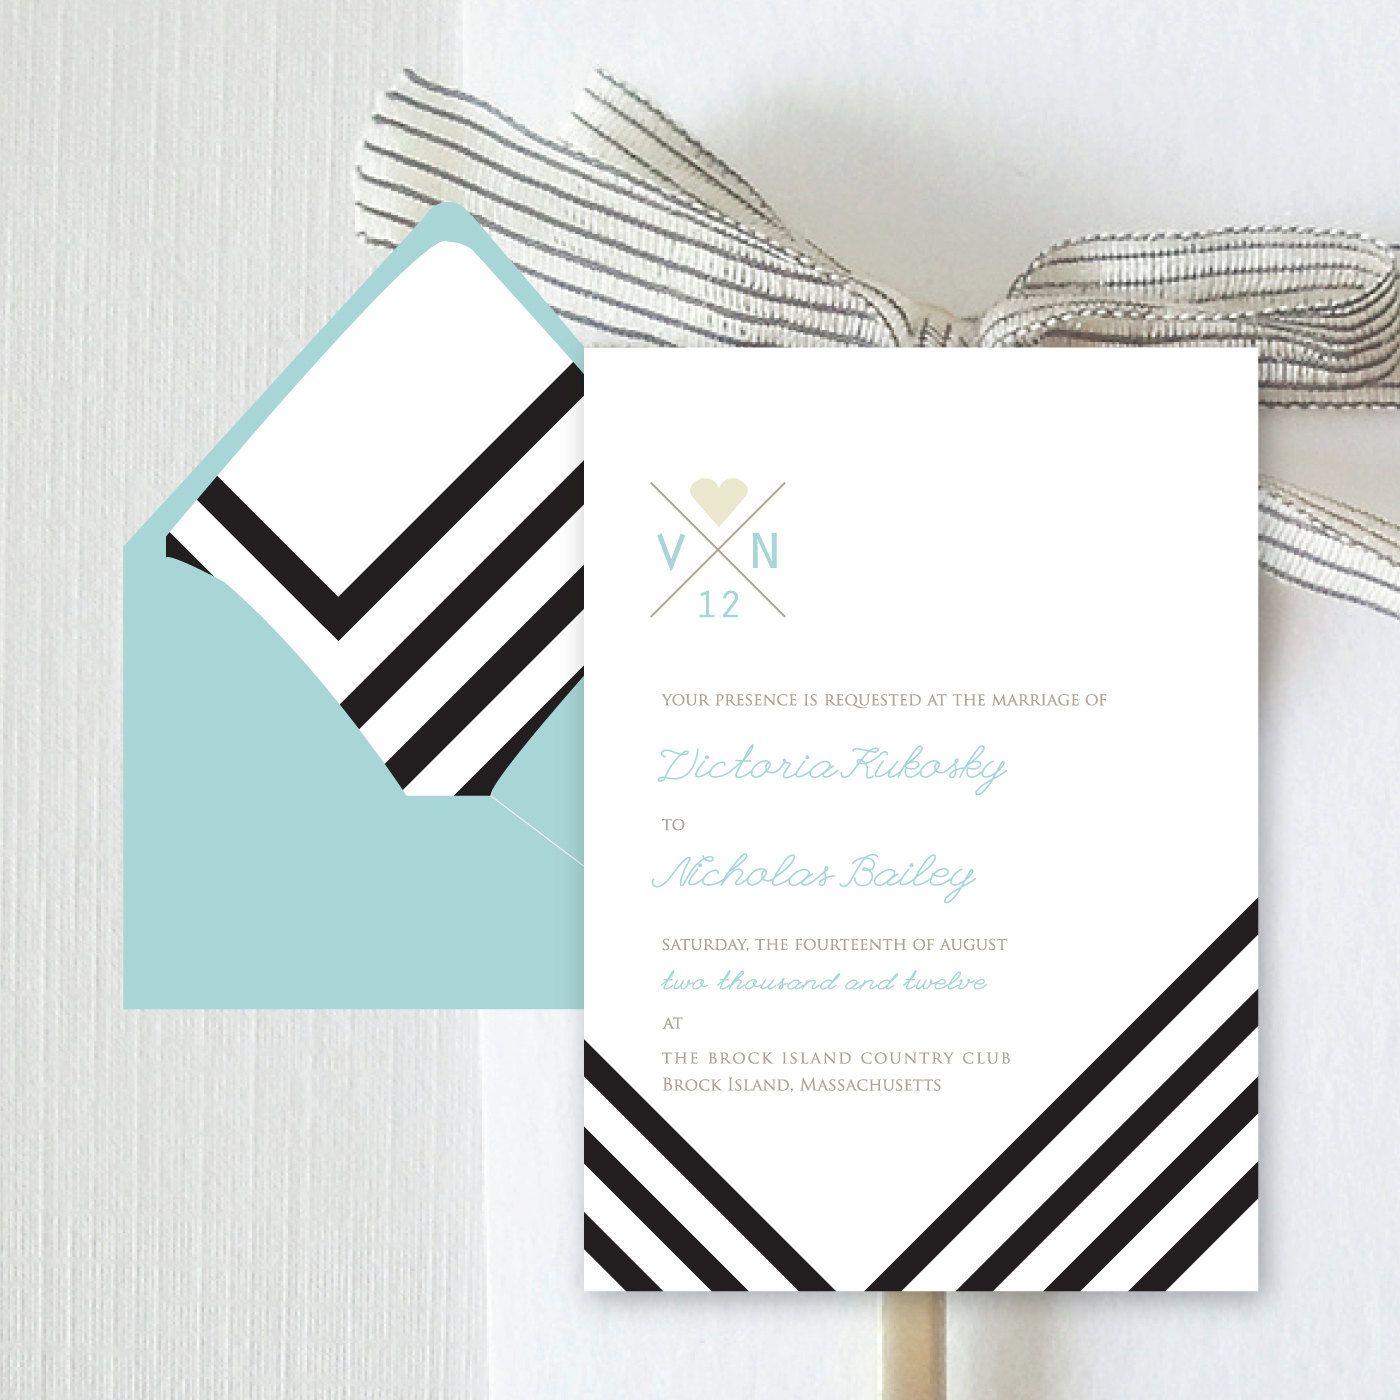 Chevron Patterned Wedding Invitation | Invitation to a partay ...